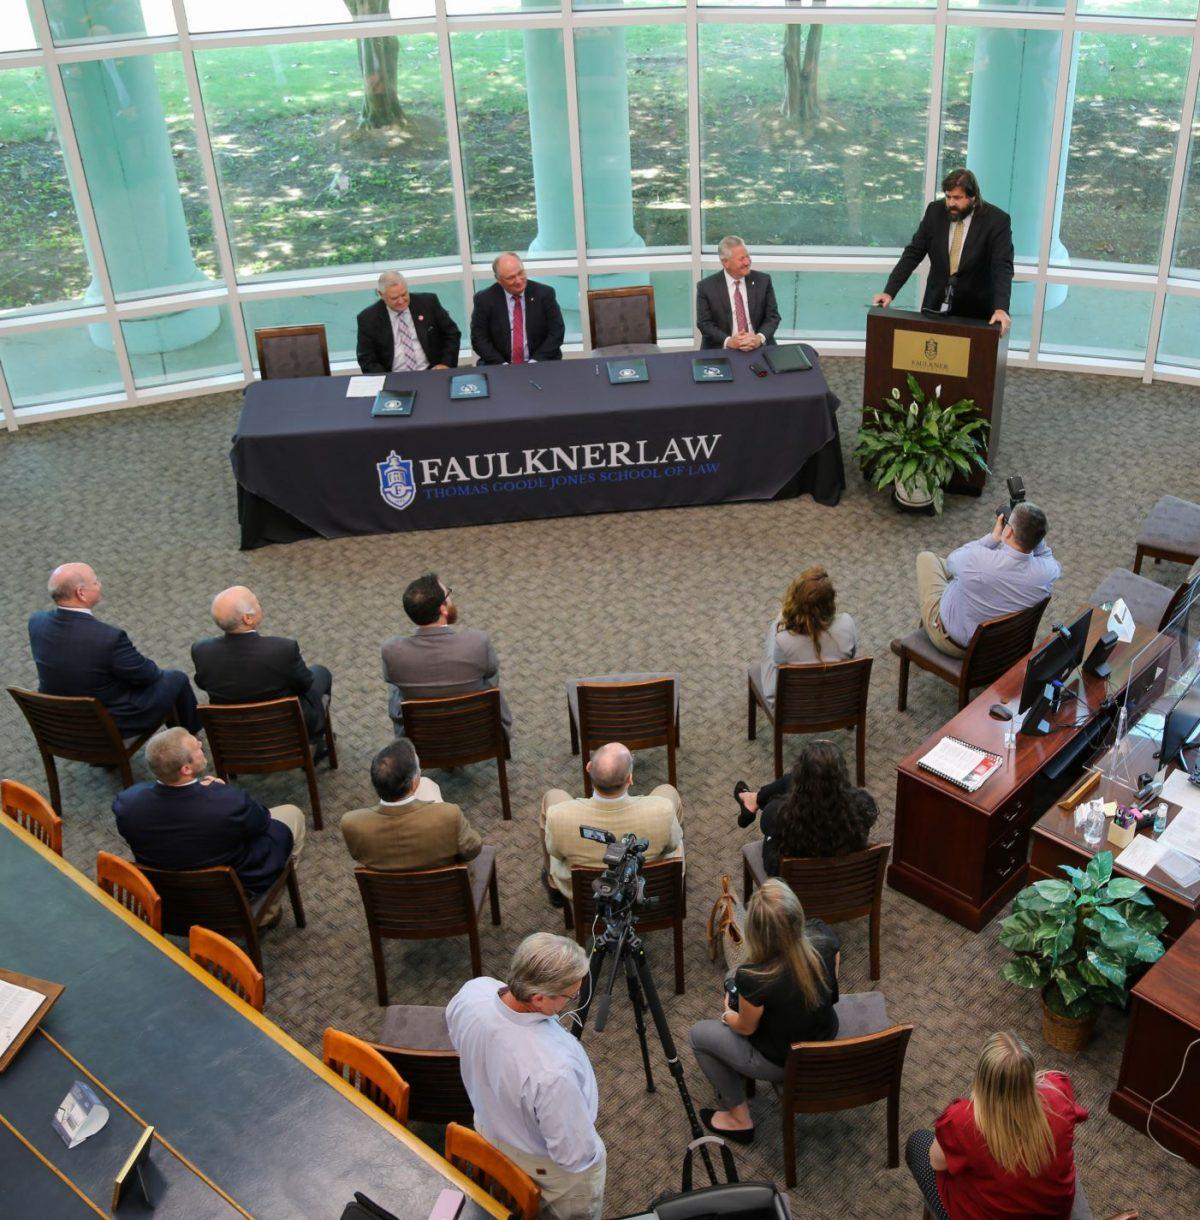 Faulkner Law hosts a memorandum of understanding signing event on June 1, 2021 to establish a three-year Alabama Ag Law Pathway.